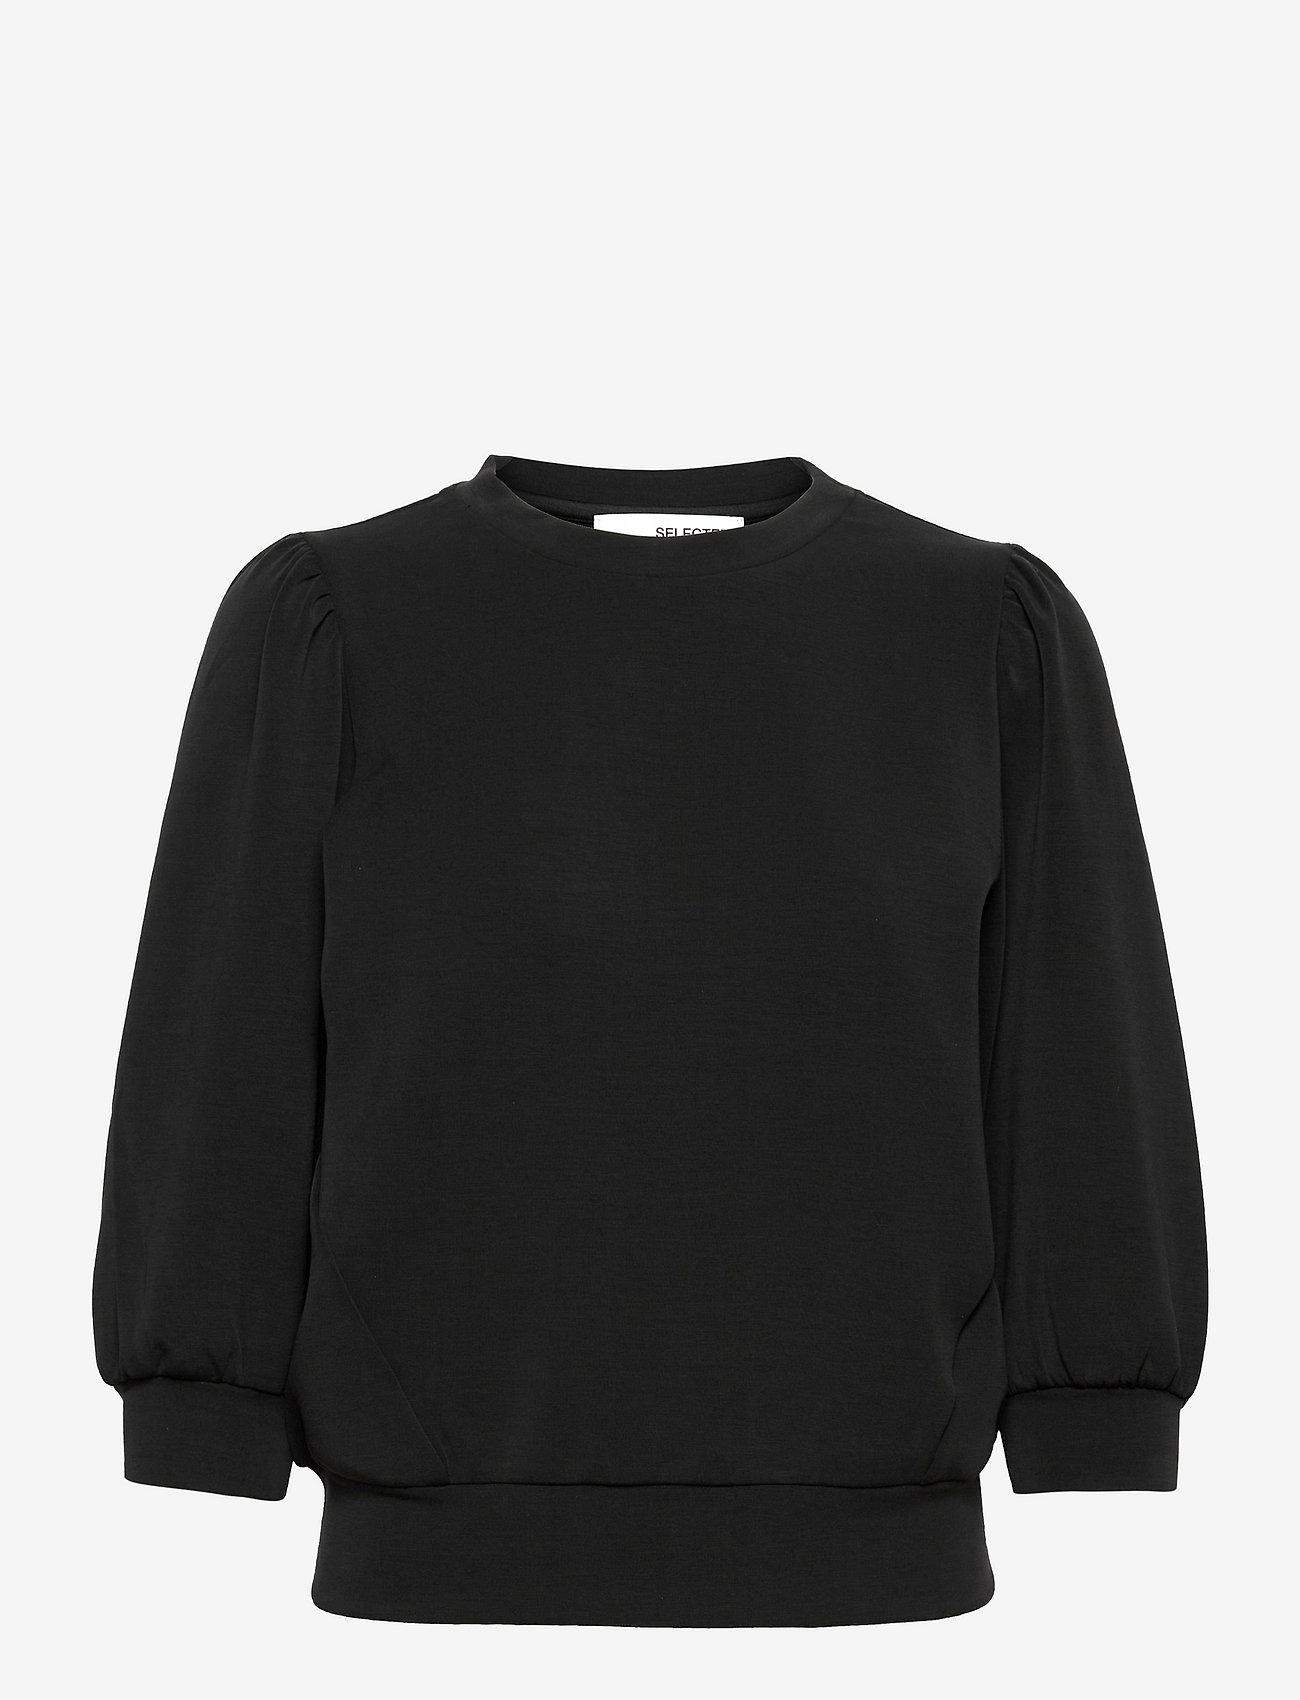 Selected Femme - SLFTENNY 3/4 SWEAT TOP - sweatshirts - black - 0